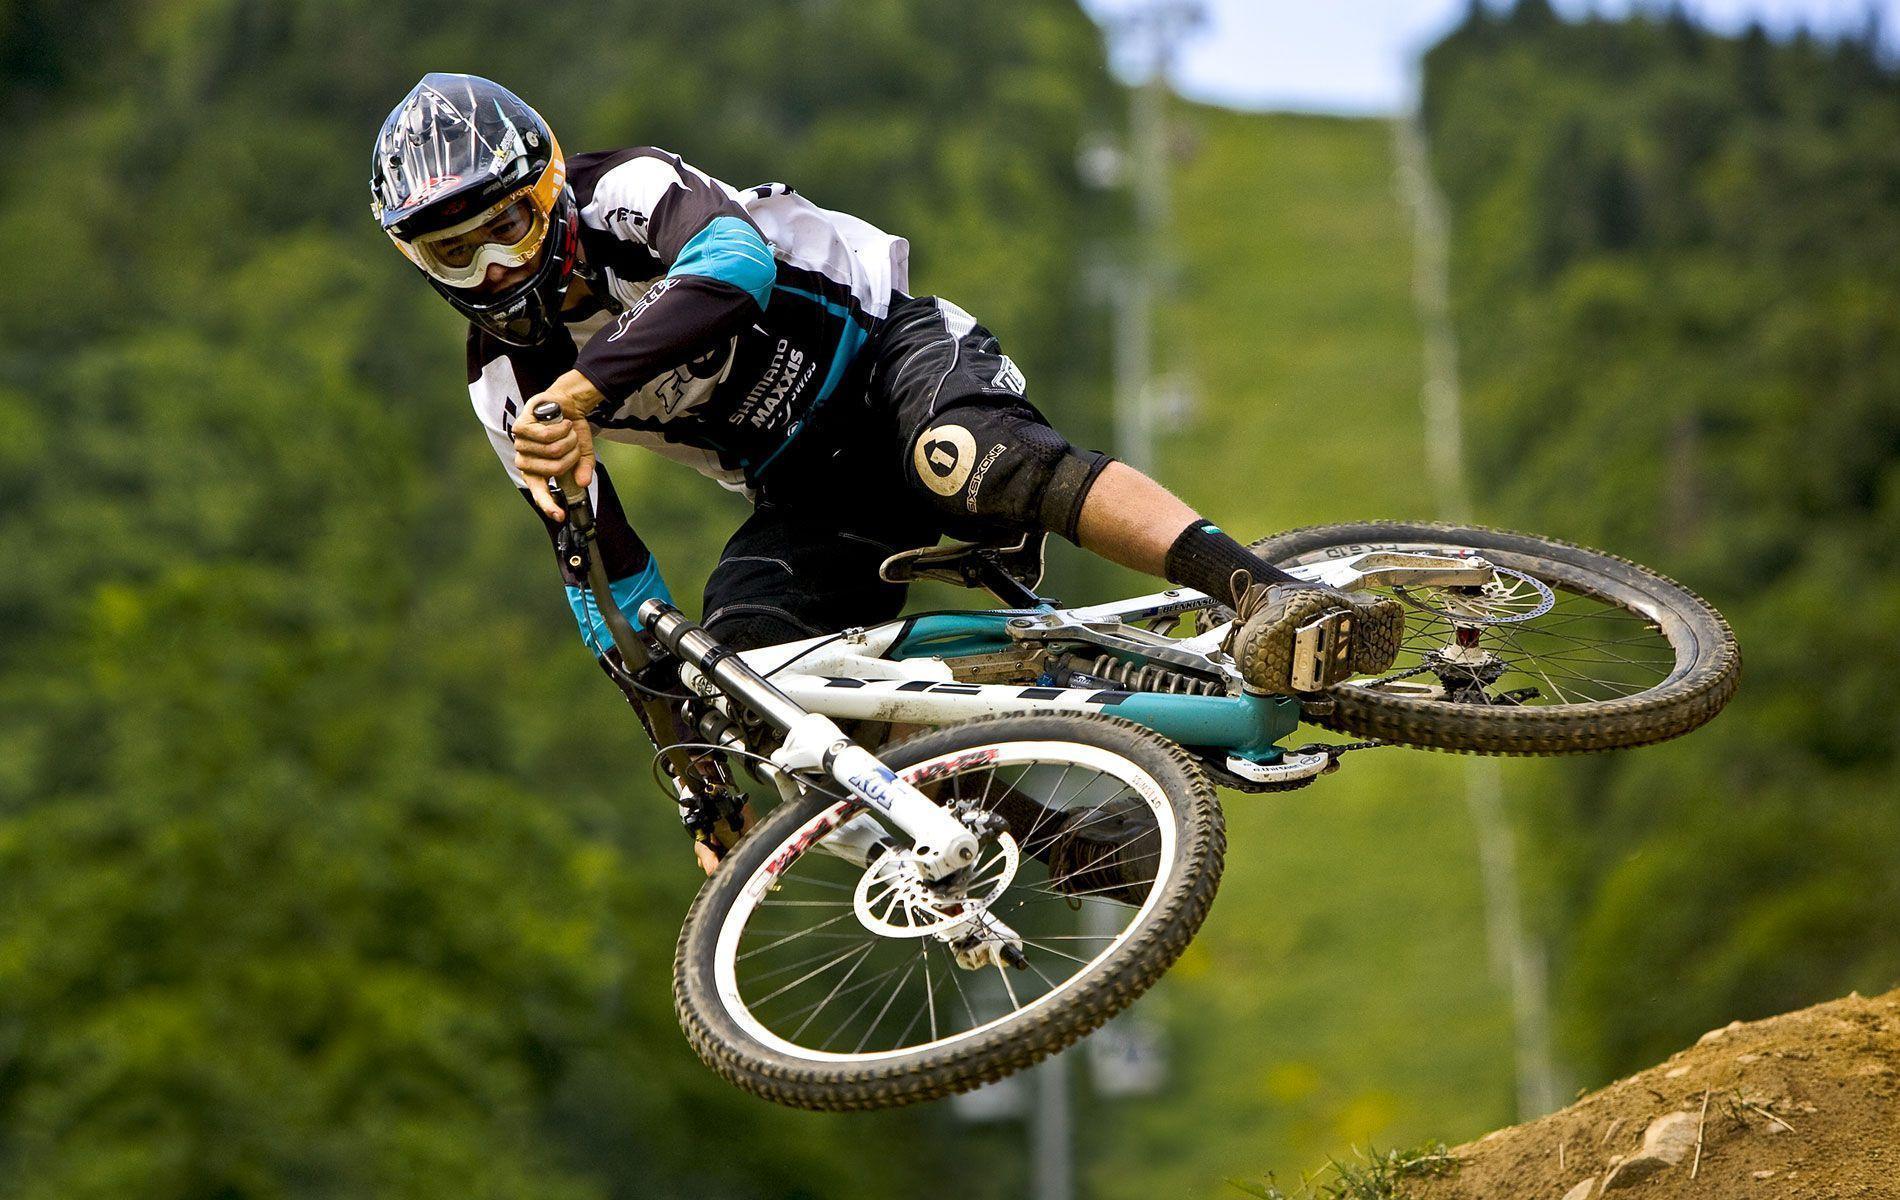 wallpaper bike sport downhill - photo #6